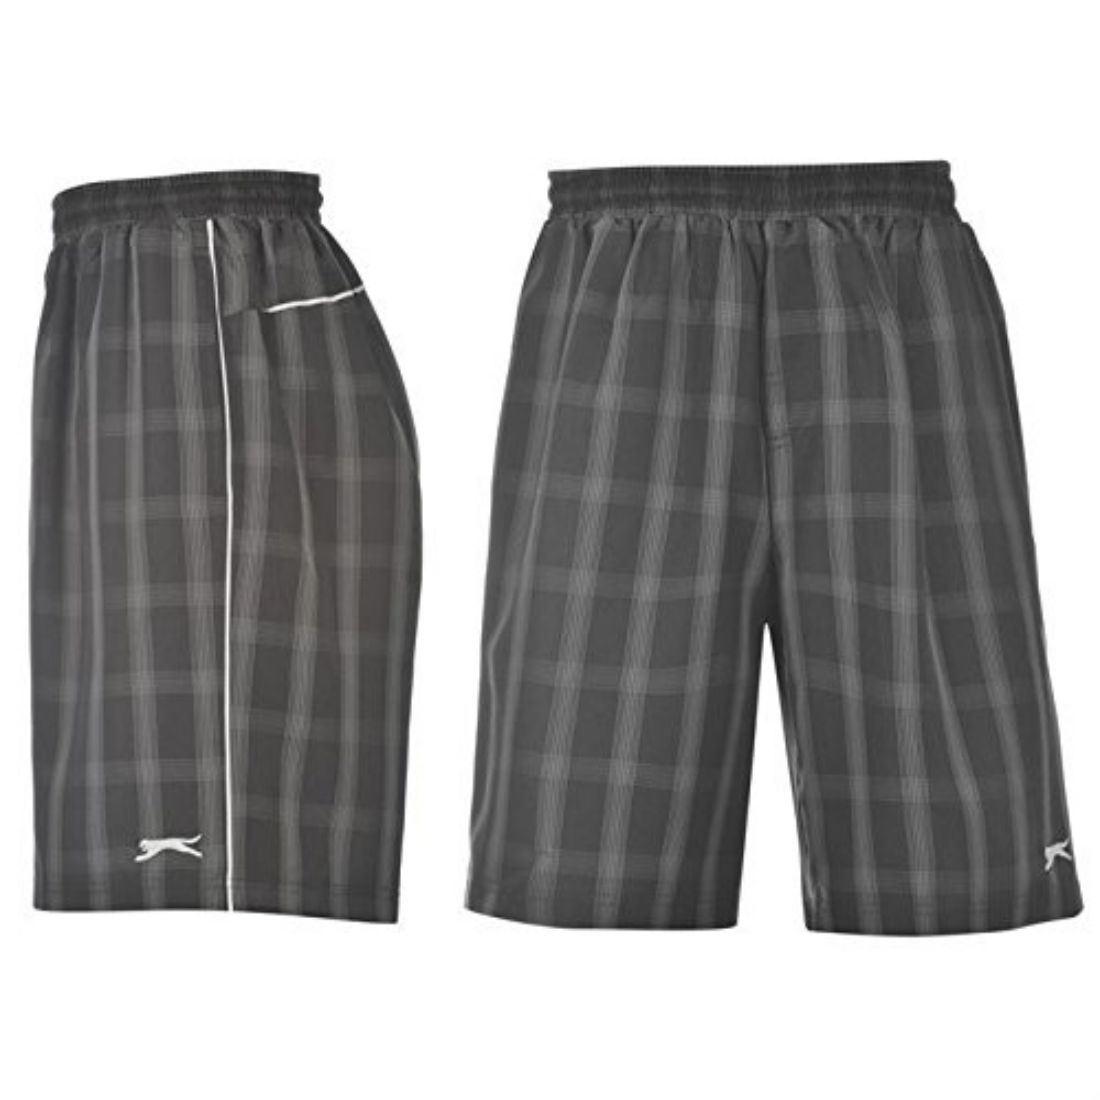 Slazenger Mens Check Shorts Pants Elasticated Waistband Internal Netting